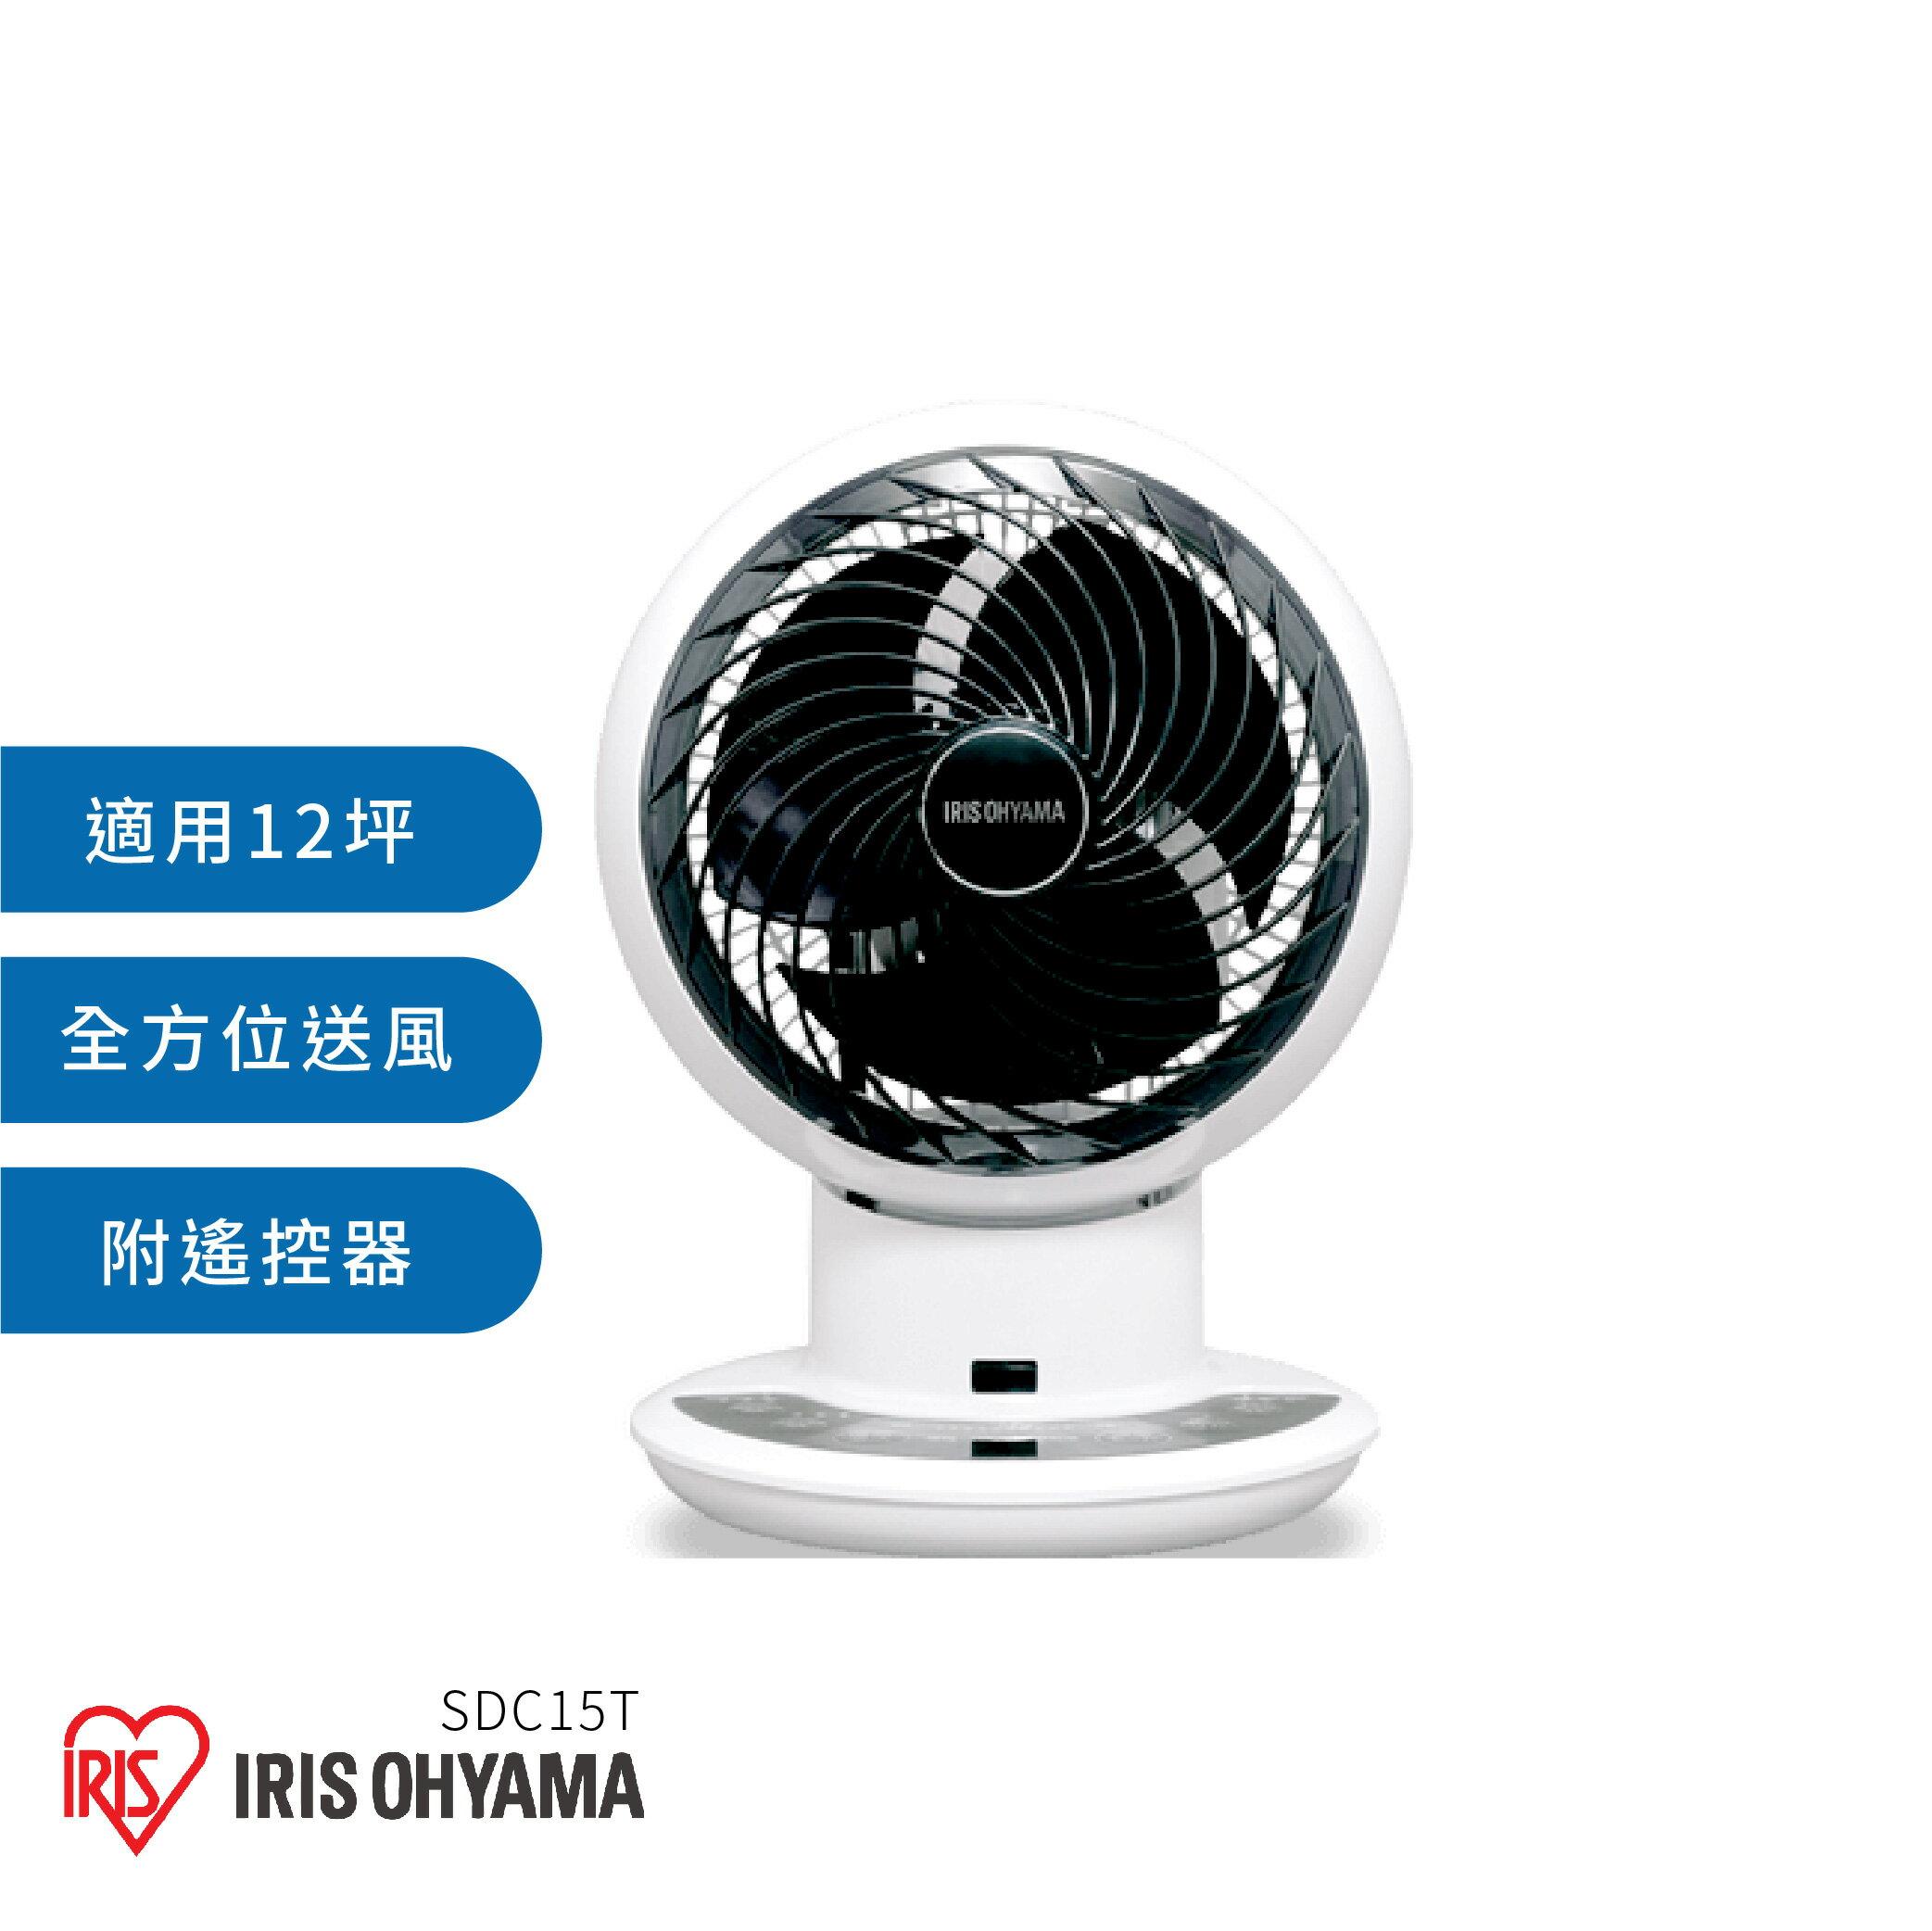 IRIS OHYAMA PCF-SDC18T SDC18T 循環扇 風扇 電風扇 電扇 靜音 上下左右擺動 自動擺動 DC直流 大風量 省電